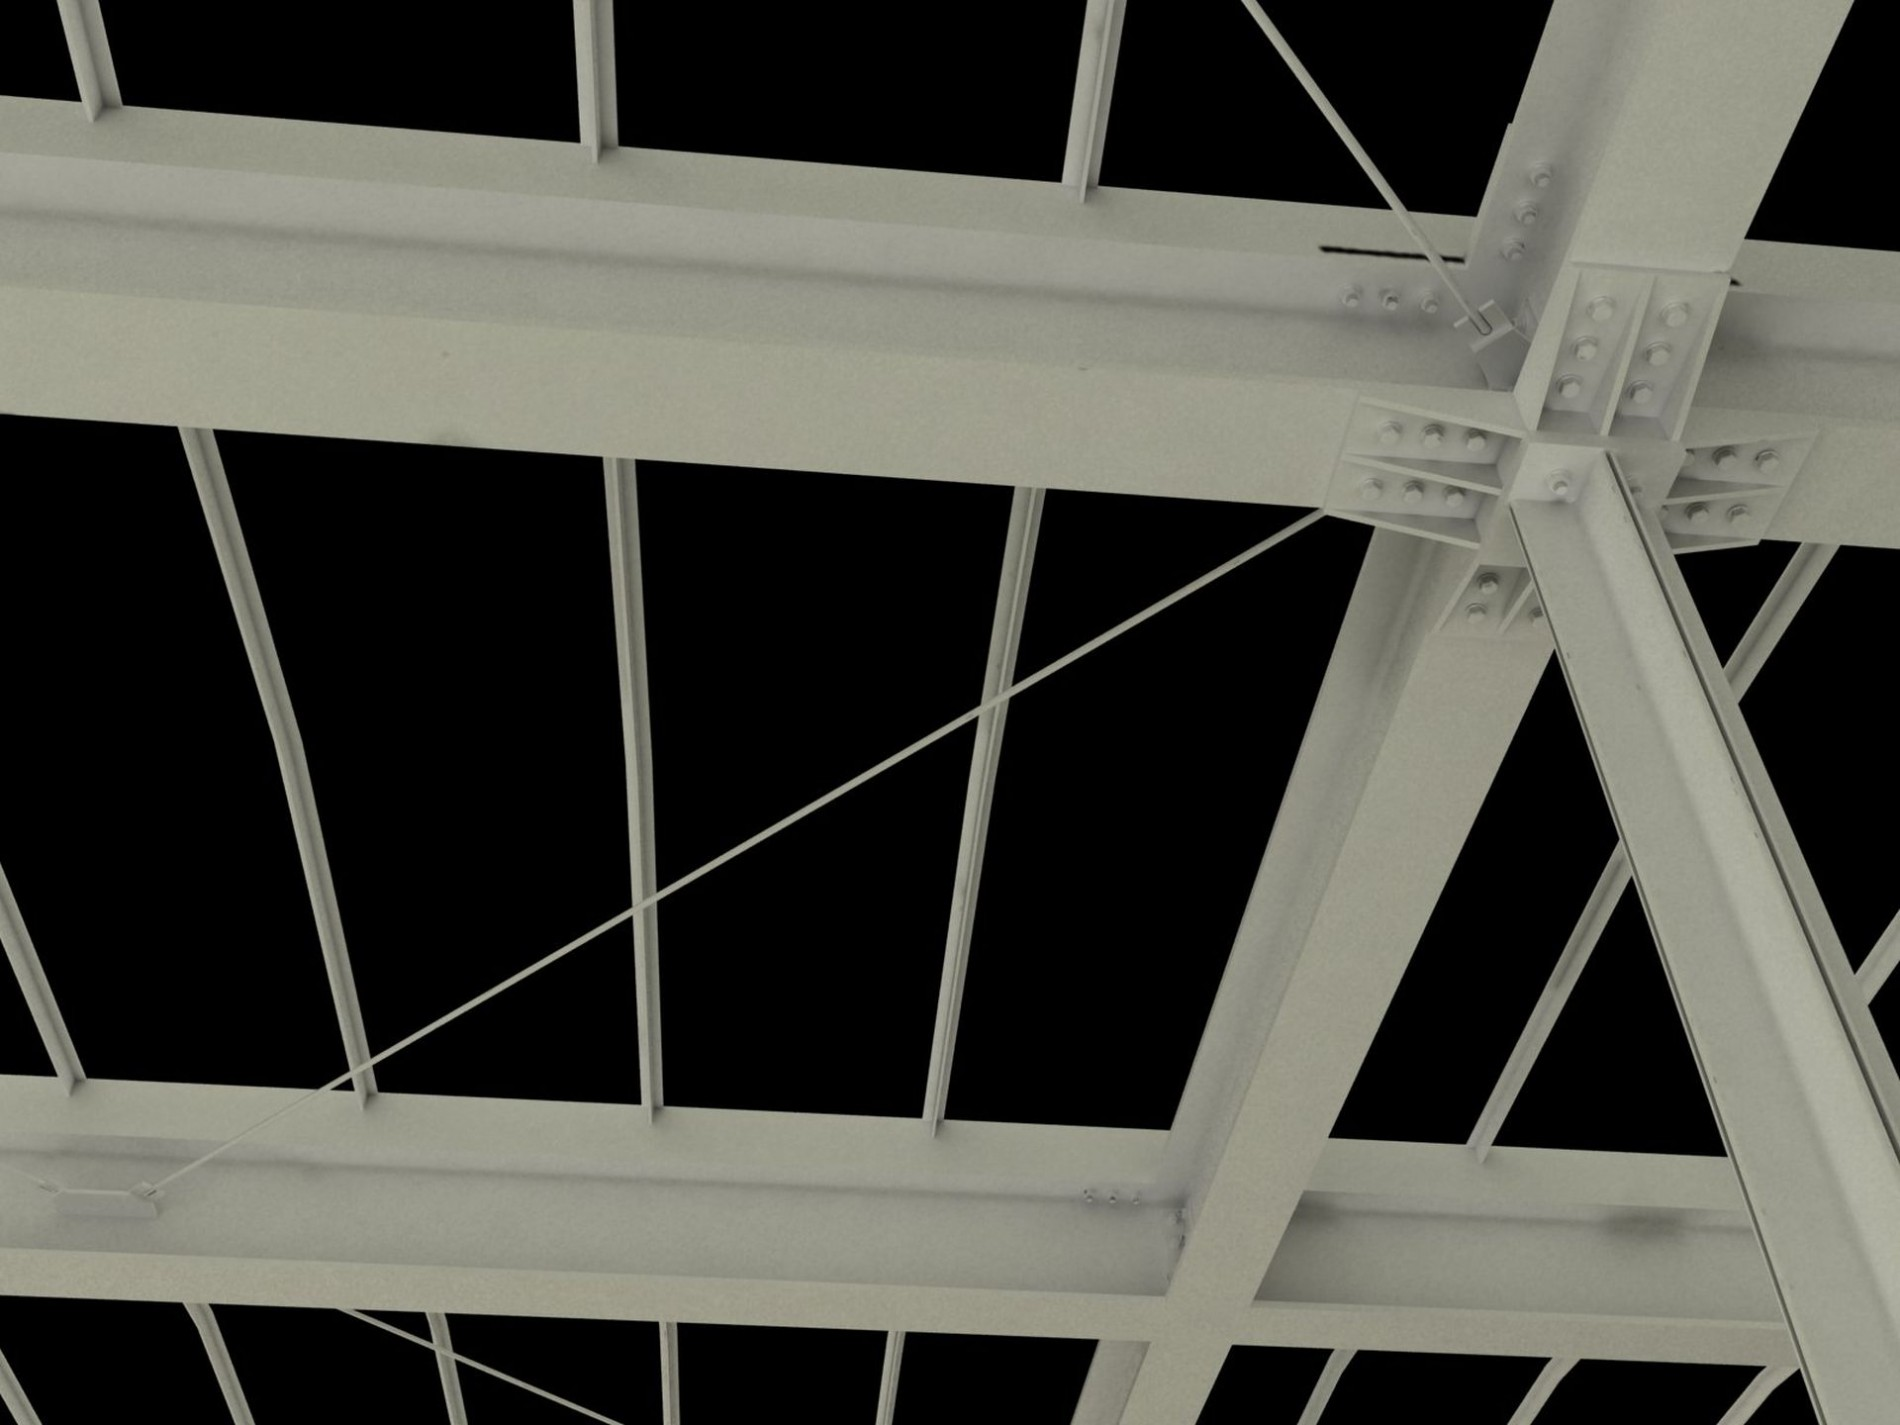 hbk, upi-2m, nenad fabijanić, structure